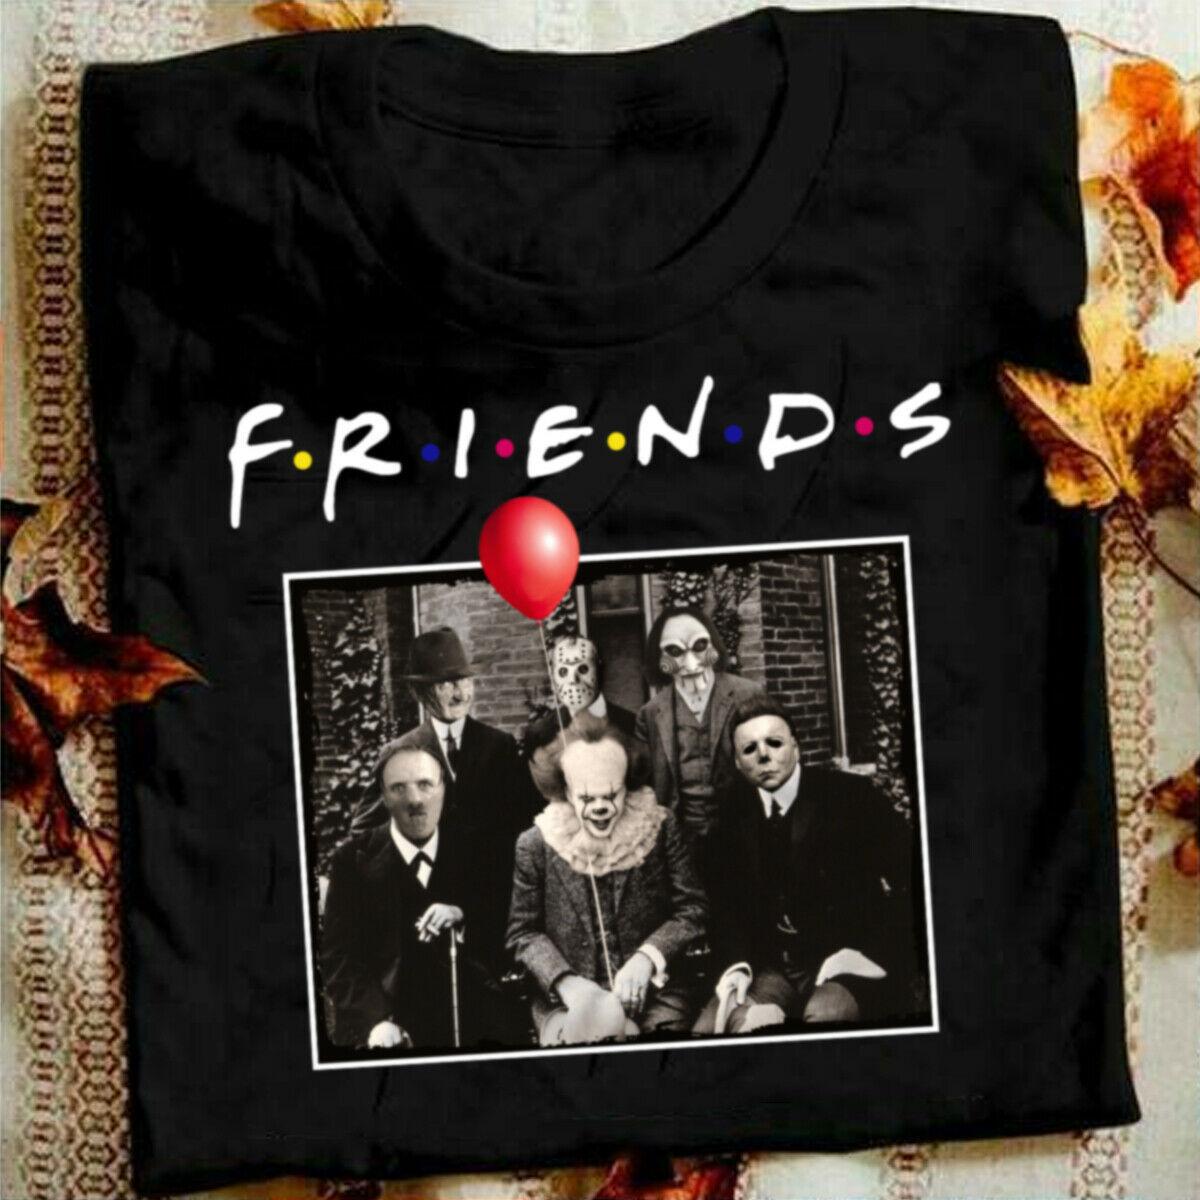 QZHIHE Horror Friends Pennywise Michael Myers Jason Voorhees Halloween Men T-Shirt Cotton Matching T-shirt